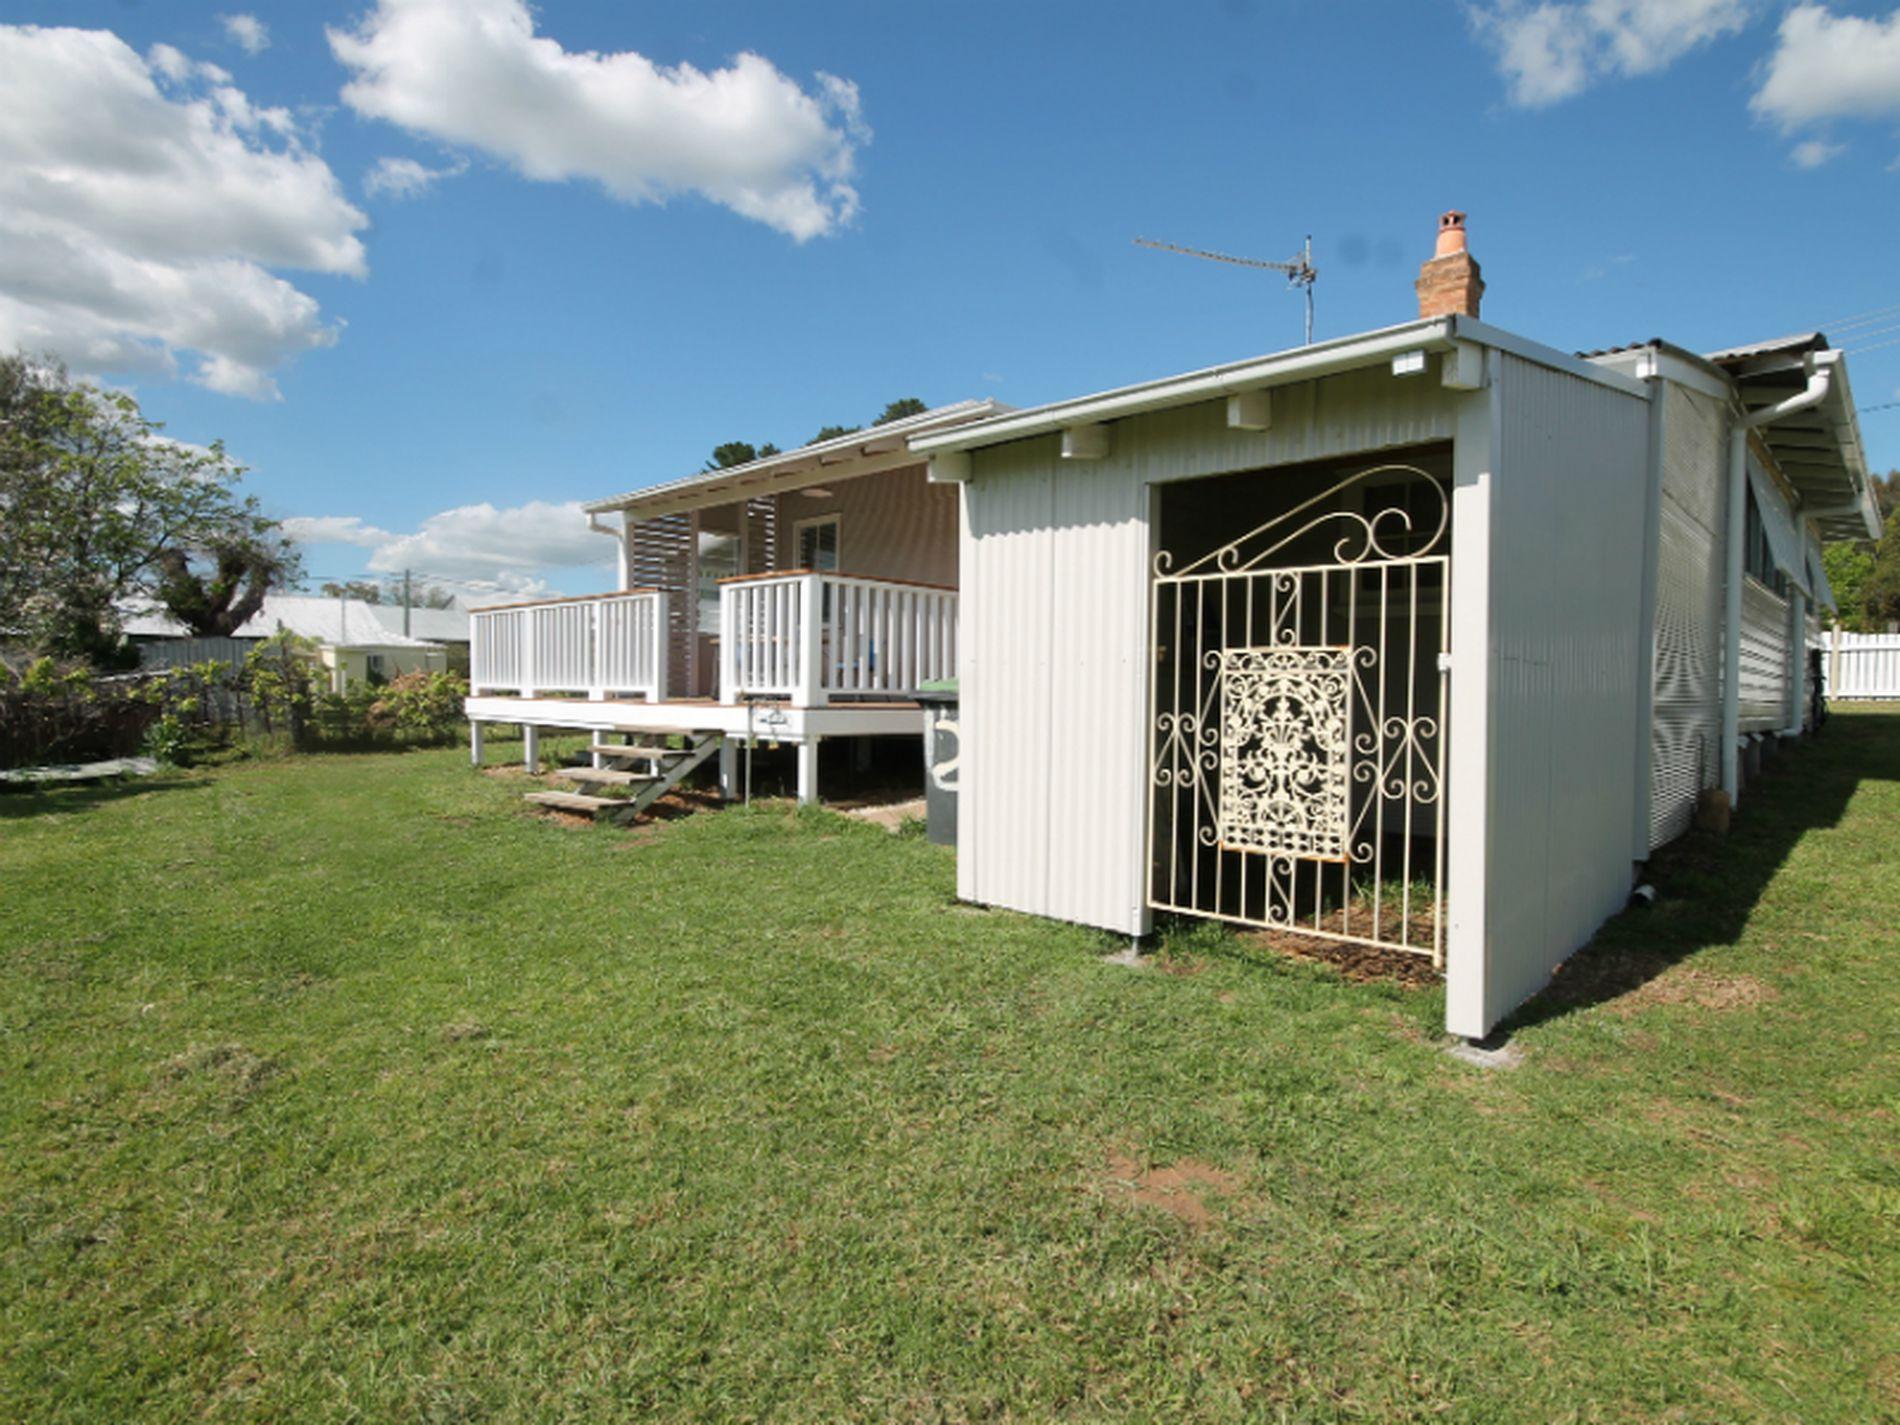 2 Gooch Street, Merriwa | R M Property & Livestock